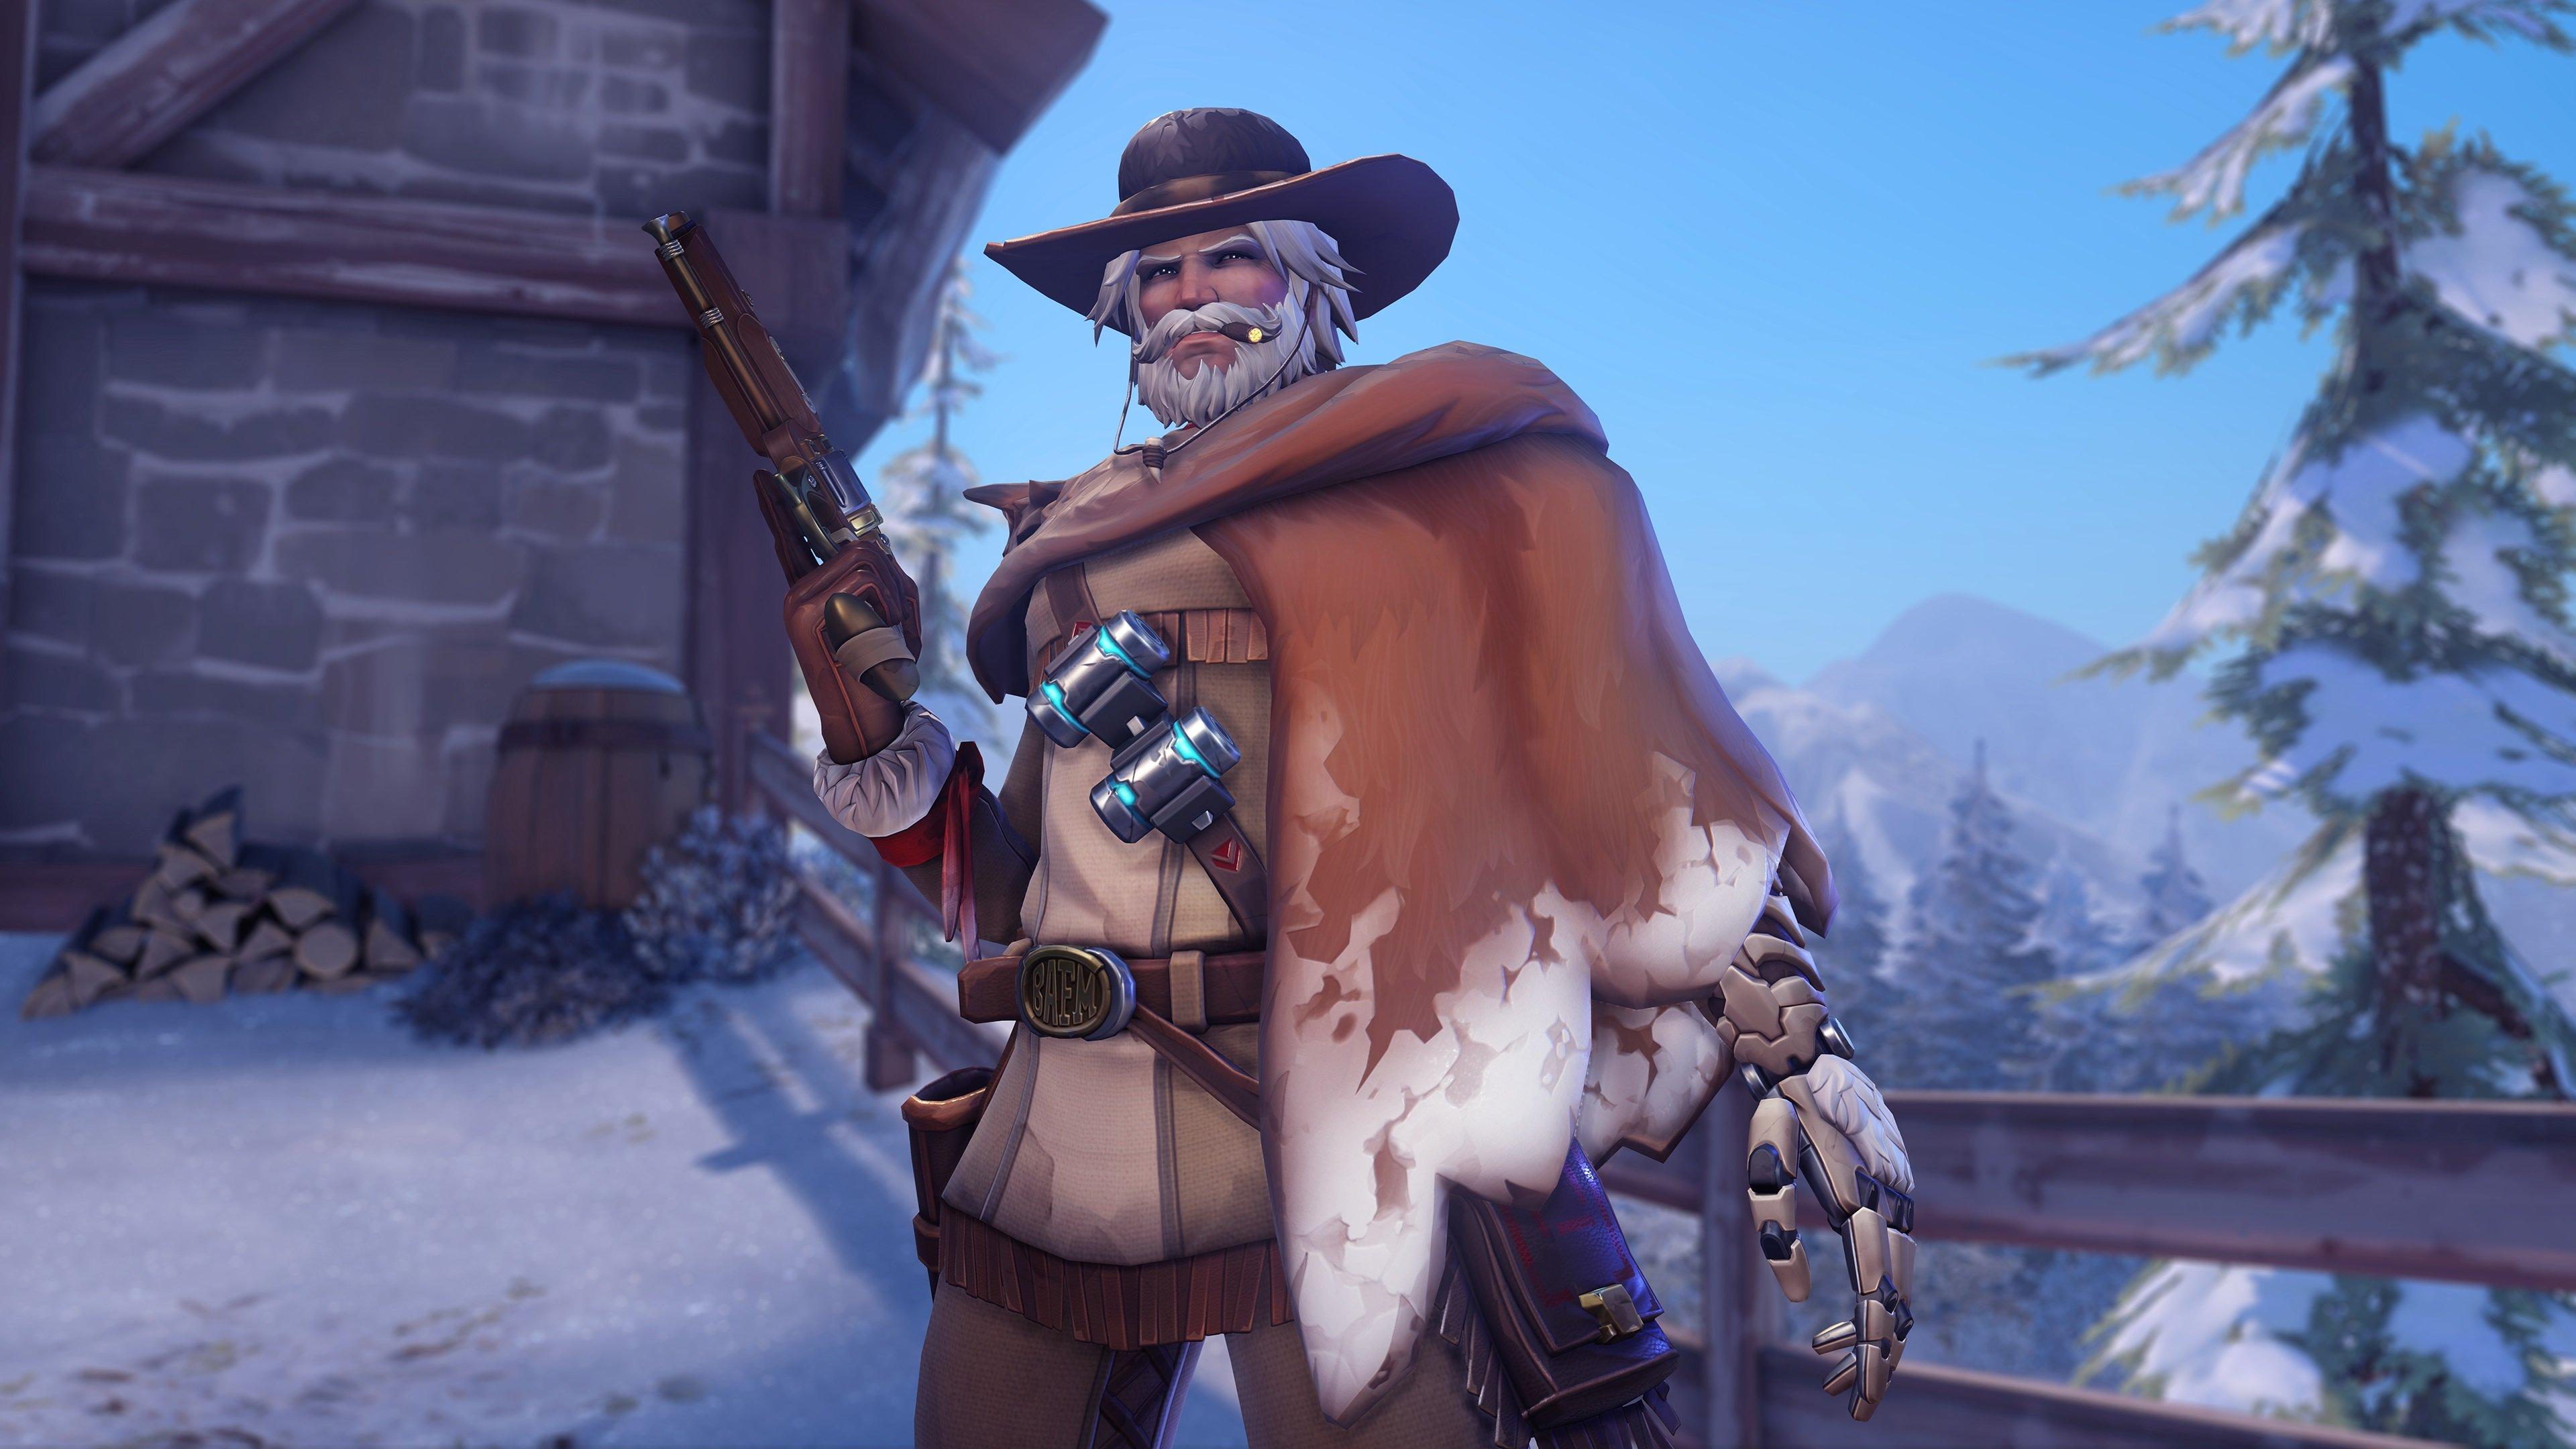 Overwatch - Mountain Man McCree